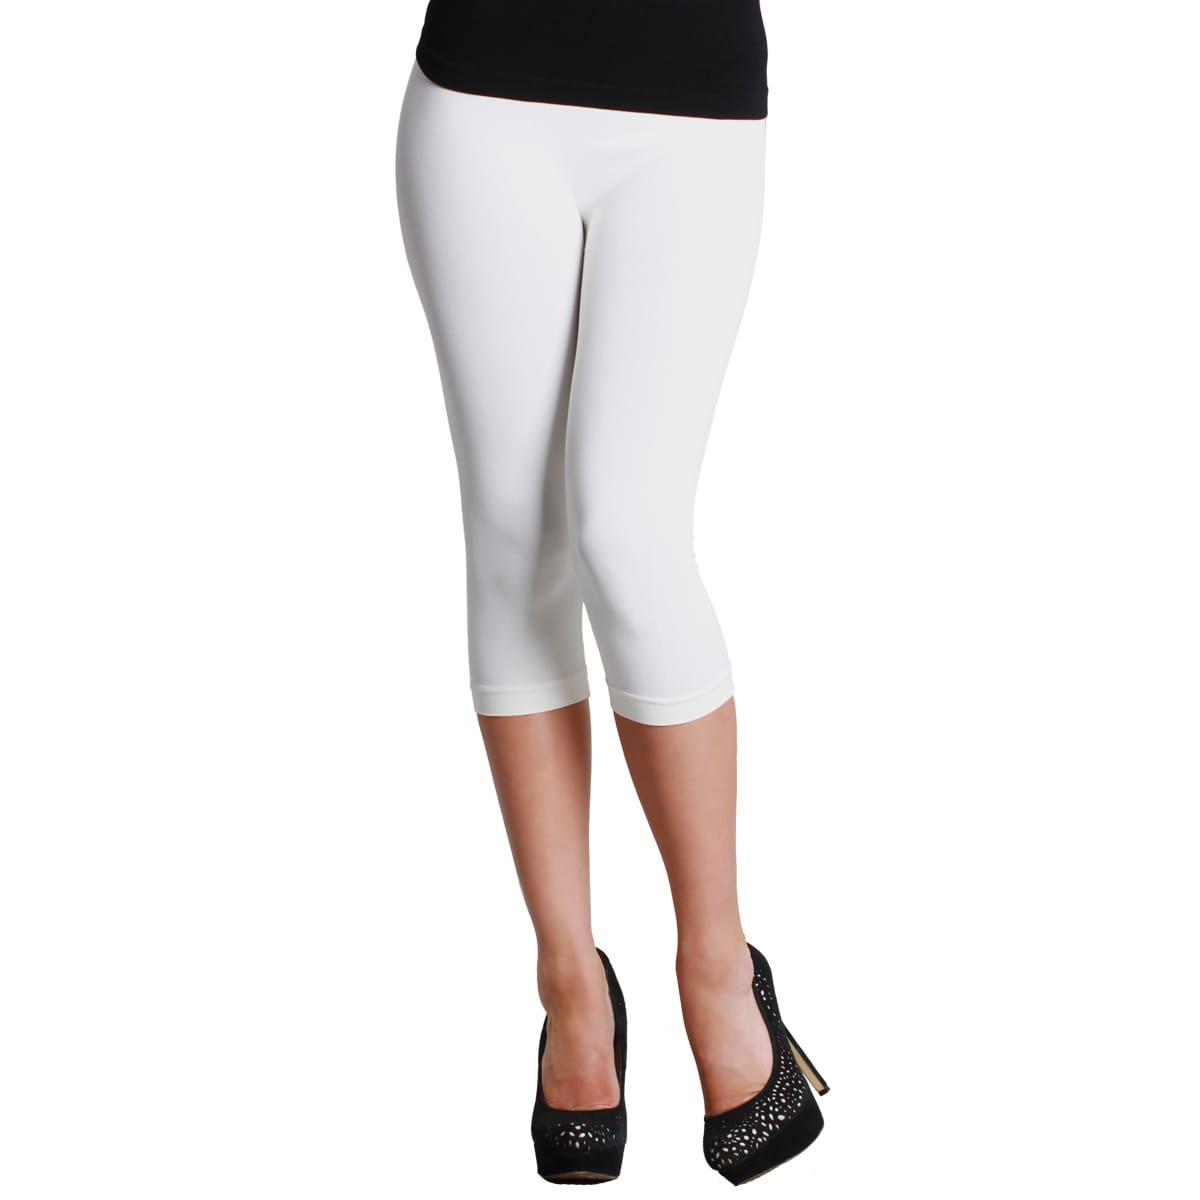 a9e36f6a3b3e2 Shop NikiBiki Women's Plain Jersey Capri Leggings - Free Shipping On Orders  Over $45 - Overstock - 9741269